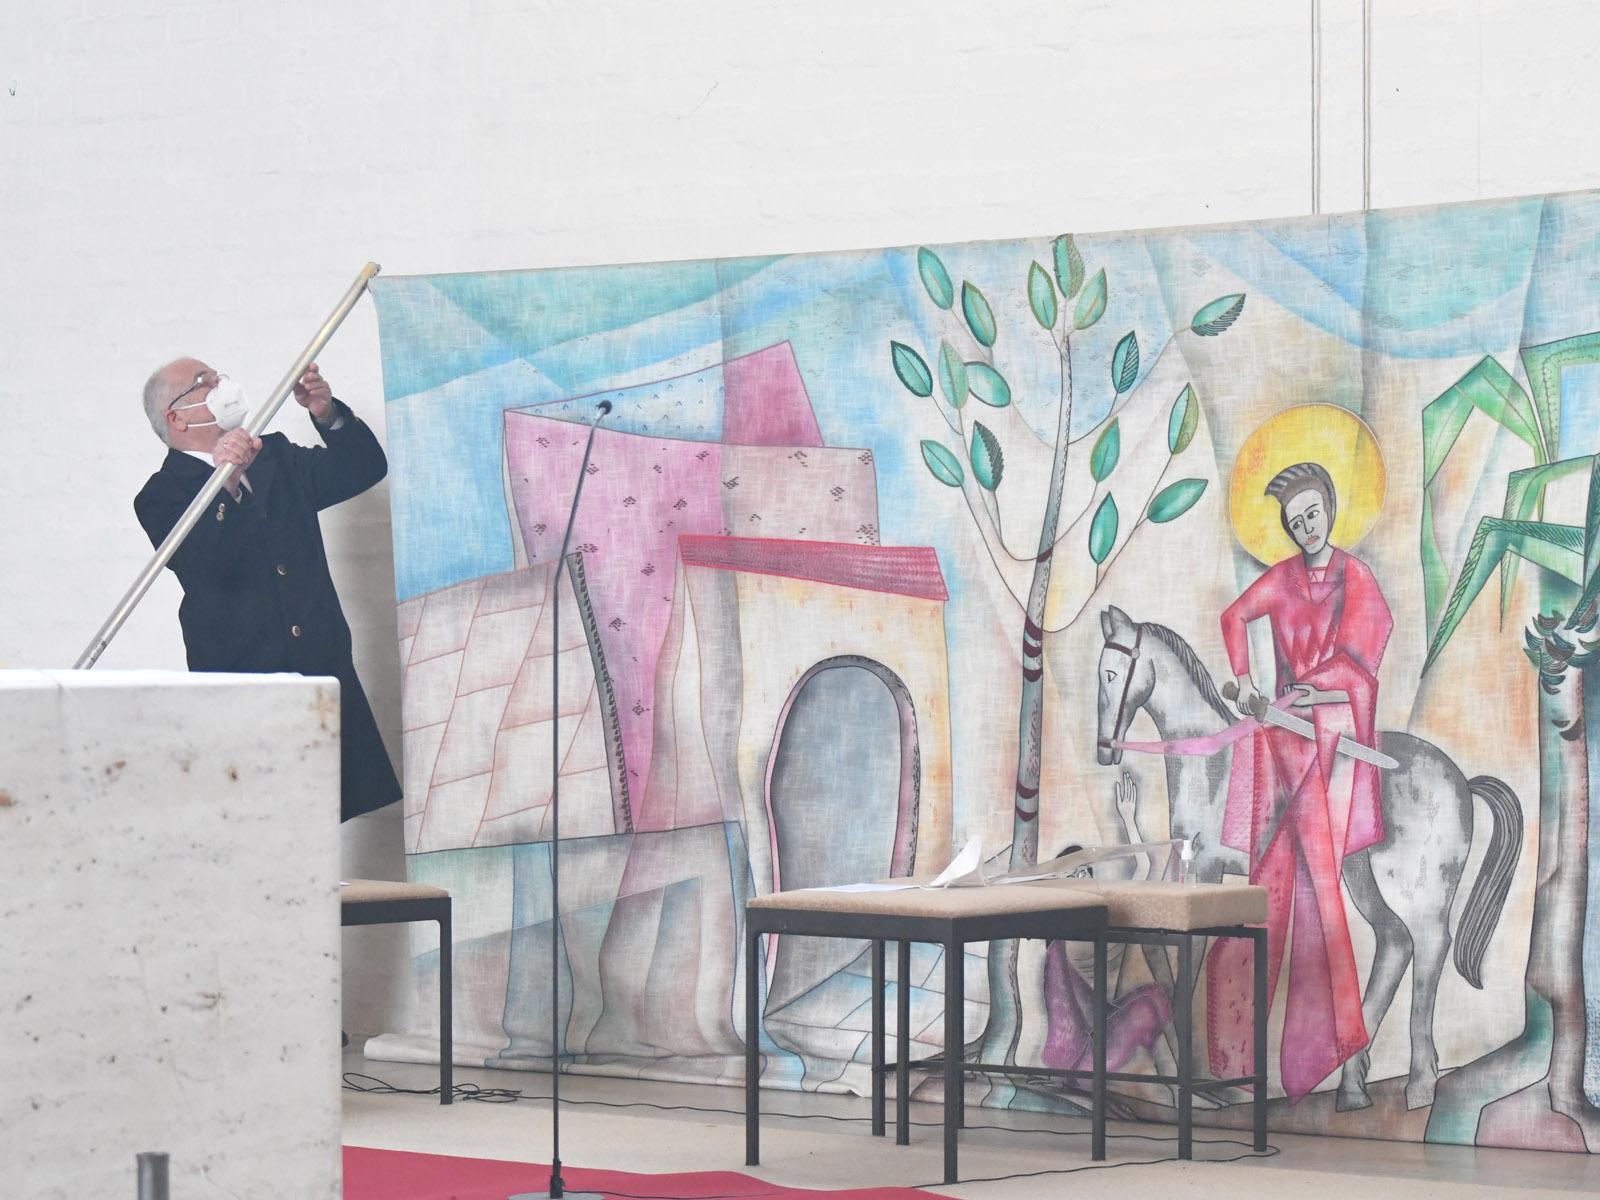 Das Martinsbild im Altarraum wird abgehängt (Foto: Julian Schmidt / pba)